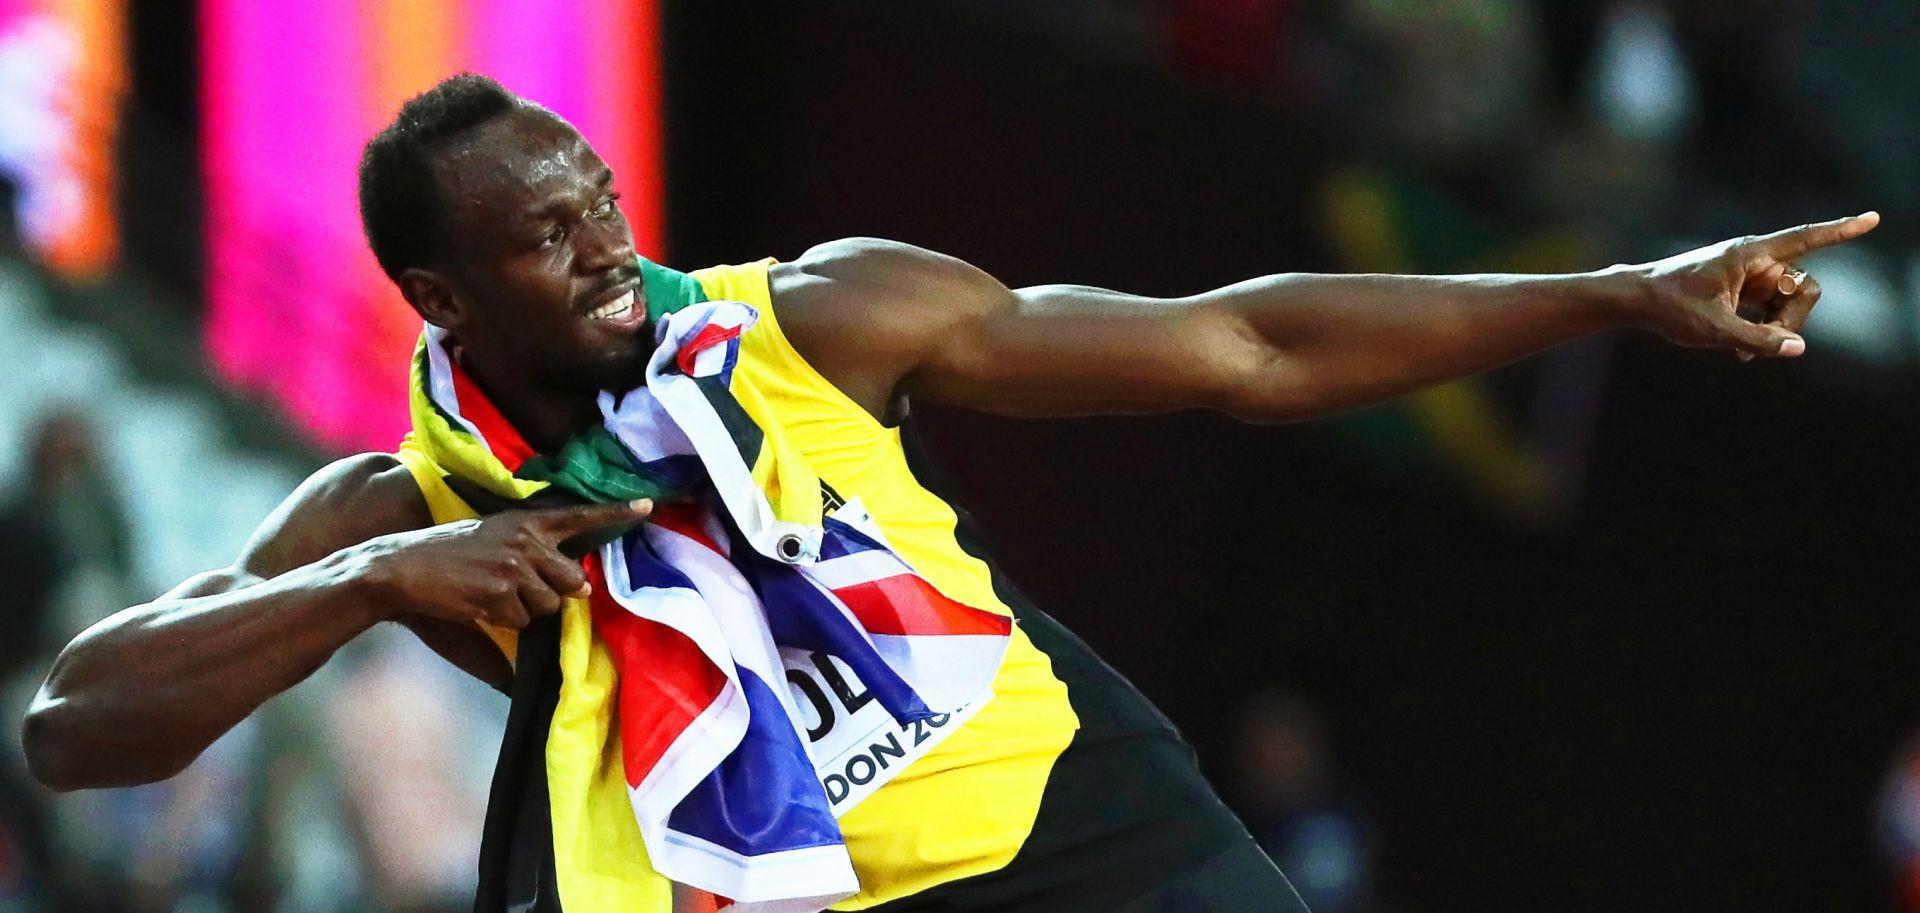 VIDEO: Usain Bolt odradio trening s nogometašima Borussie Dortmund